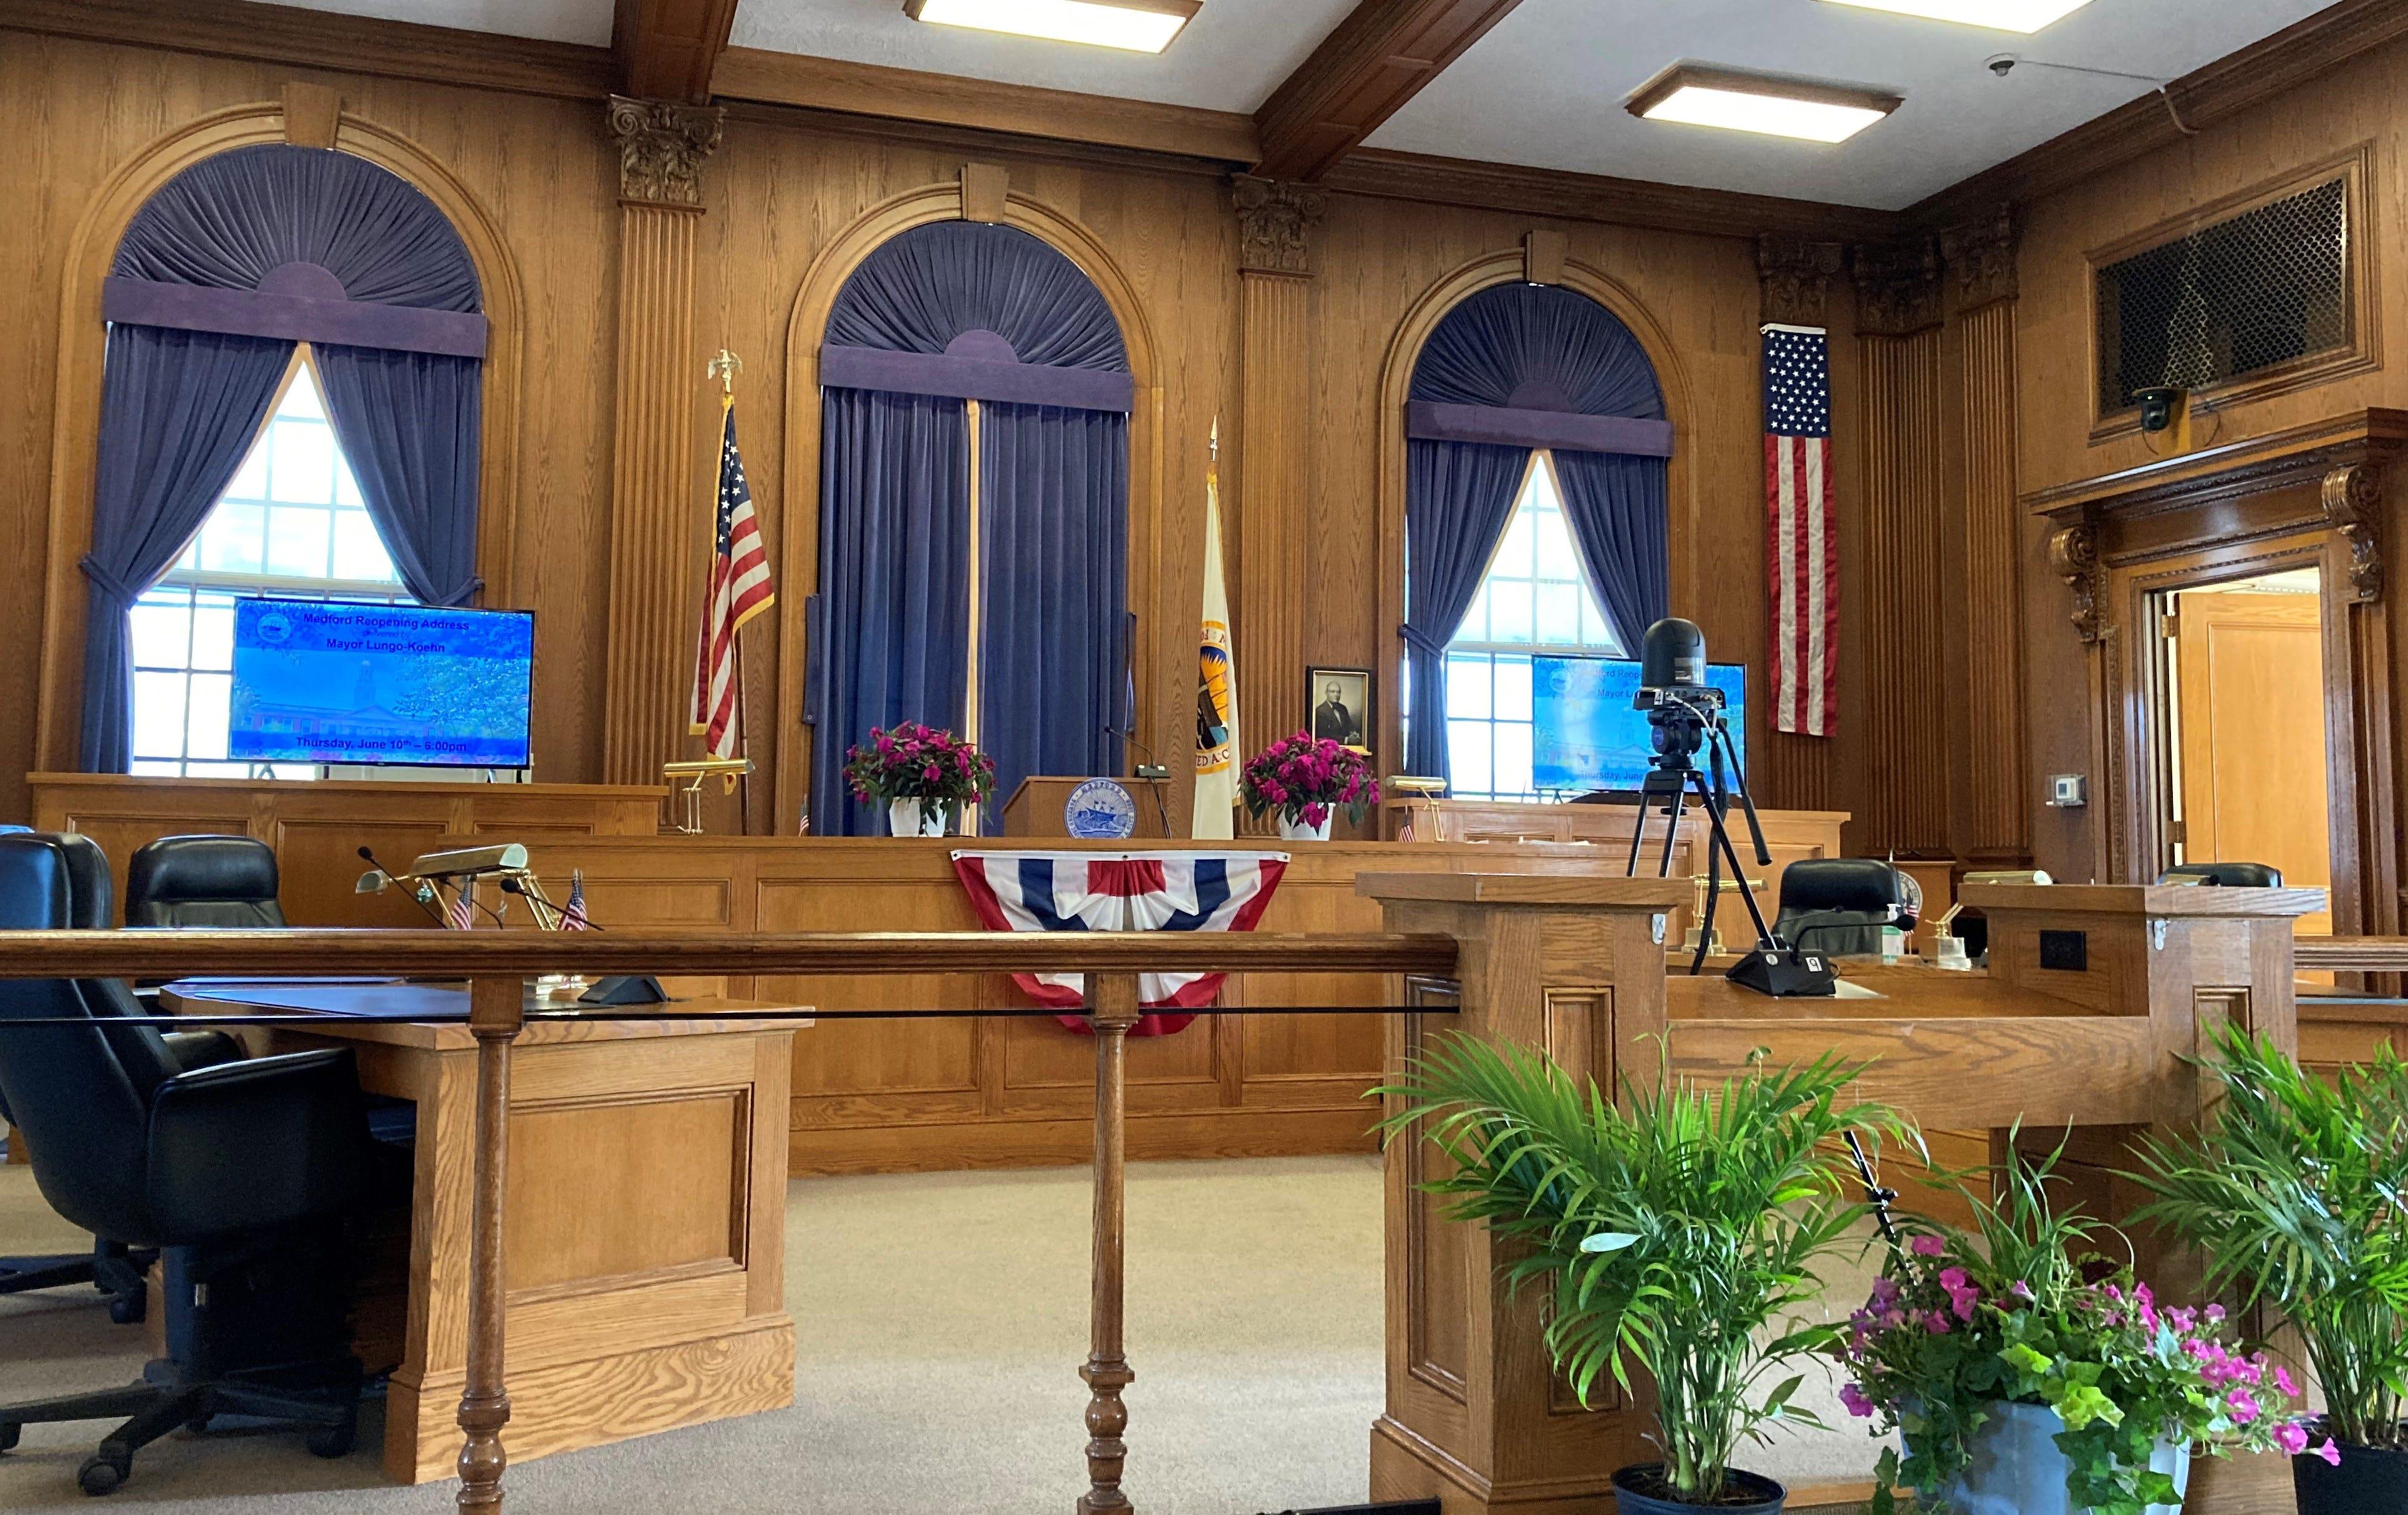 Medford City Council hopefuls answer questions